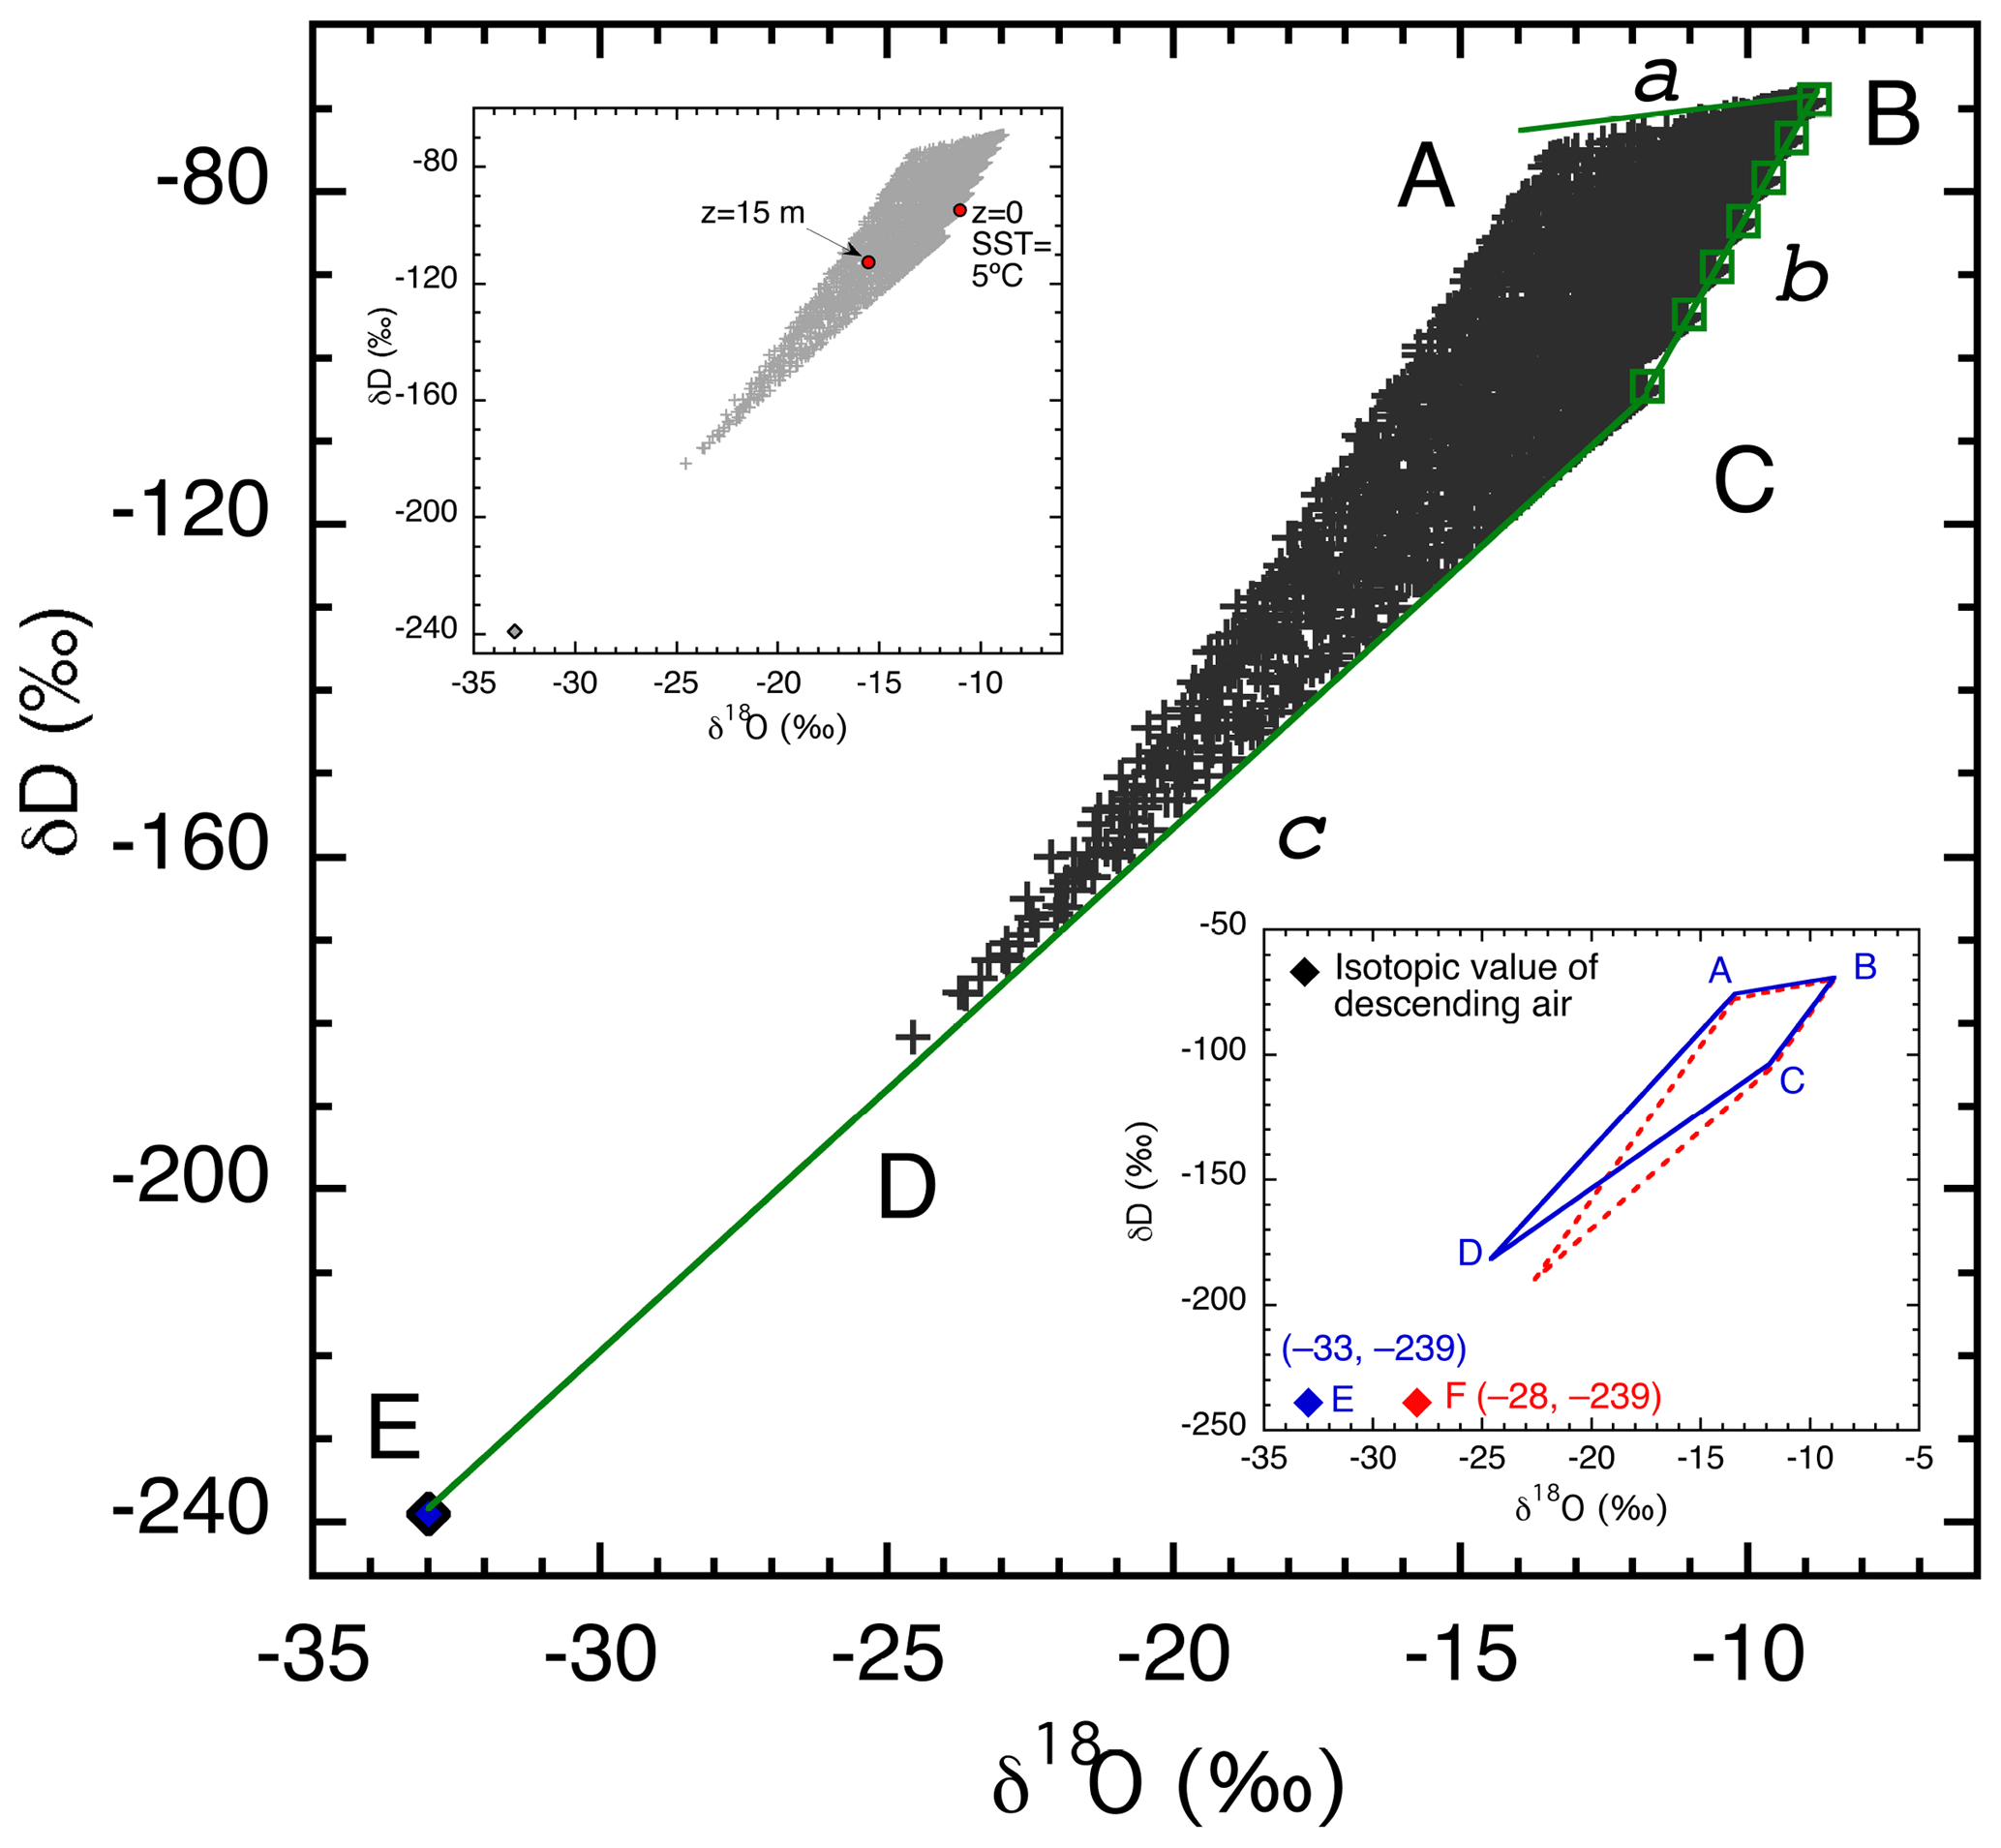 https://www.atmos-chem-phys.net/19/4005/2019/acp-19-4005-2019-f04